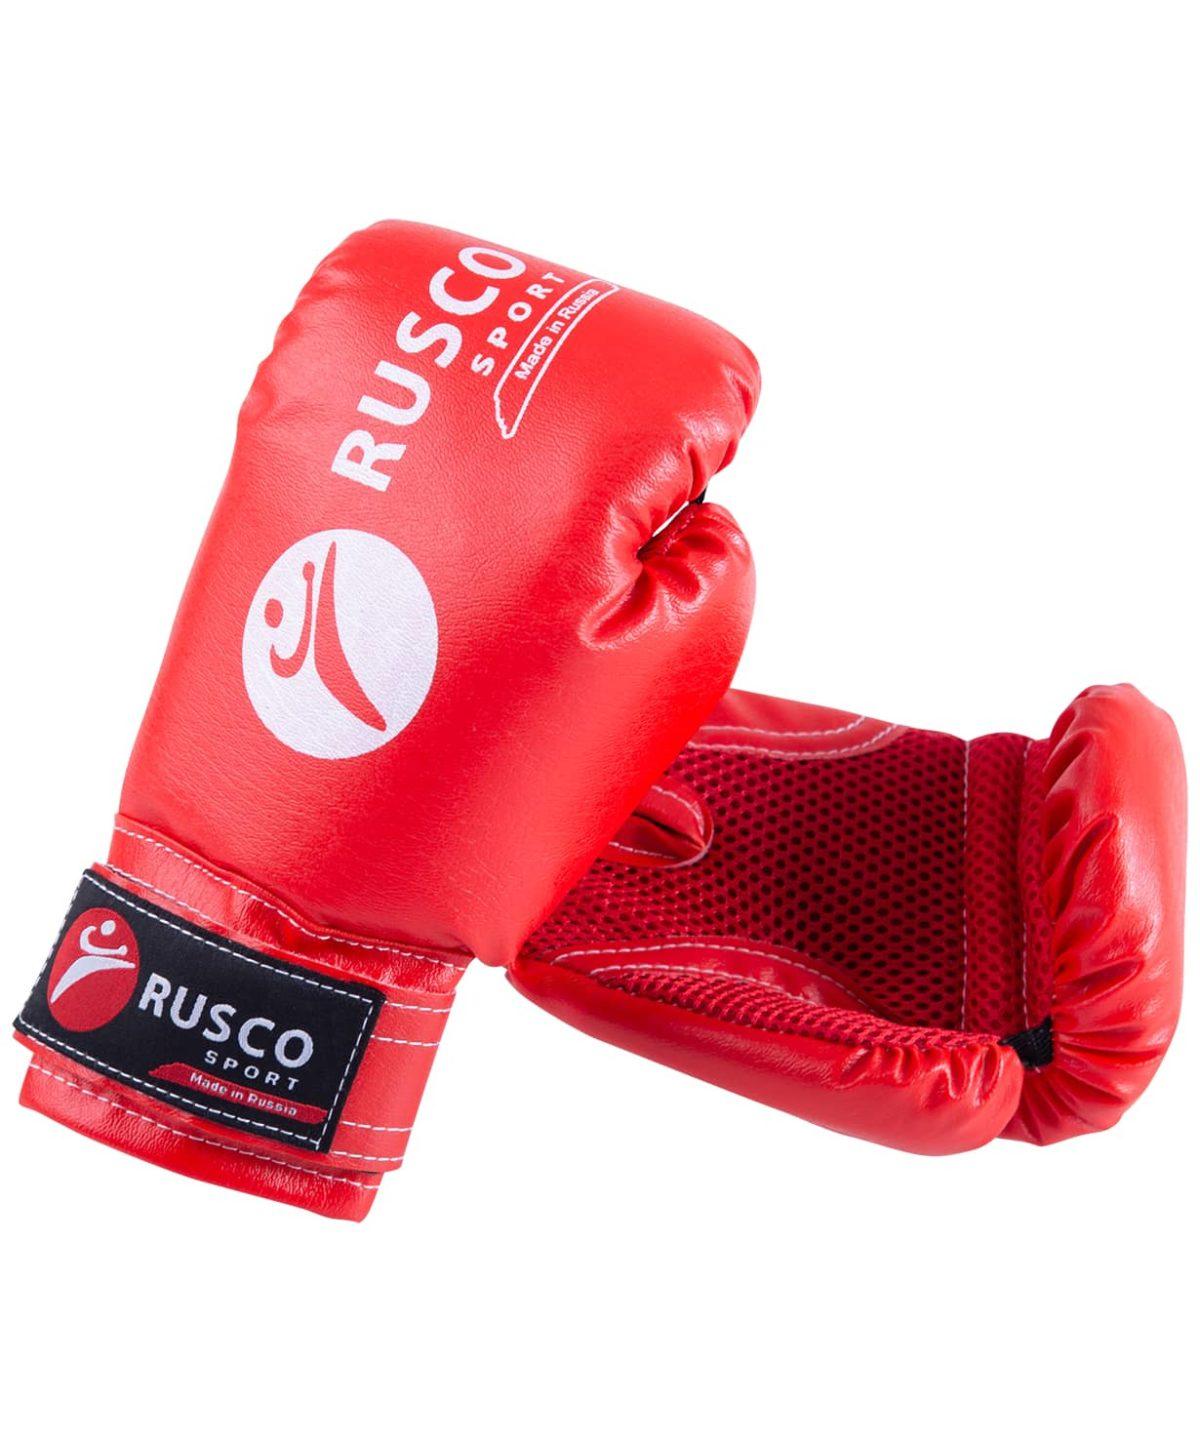 RUSCO Набор для бокса 6oz, к/з  18537 - 3